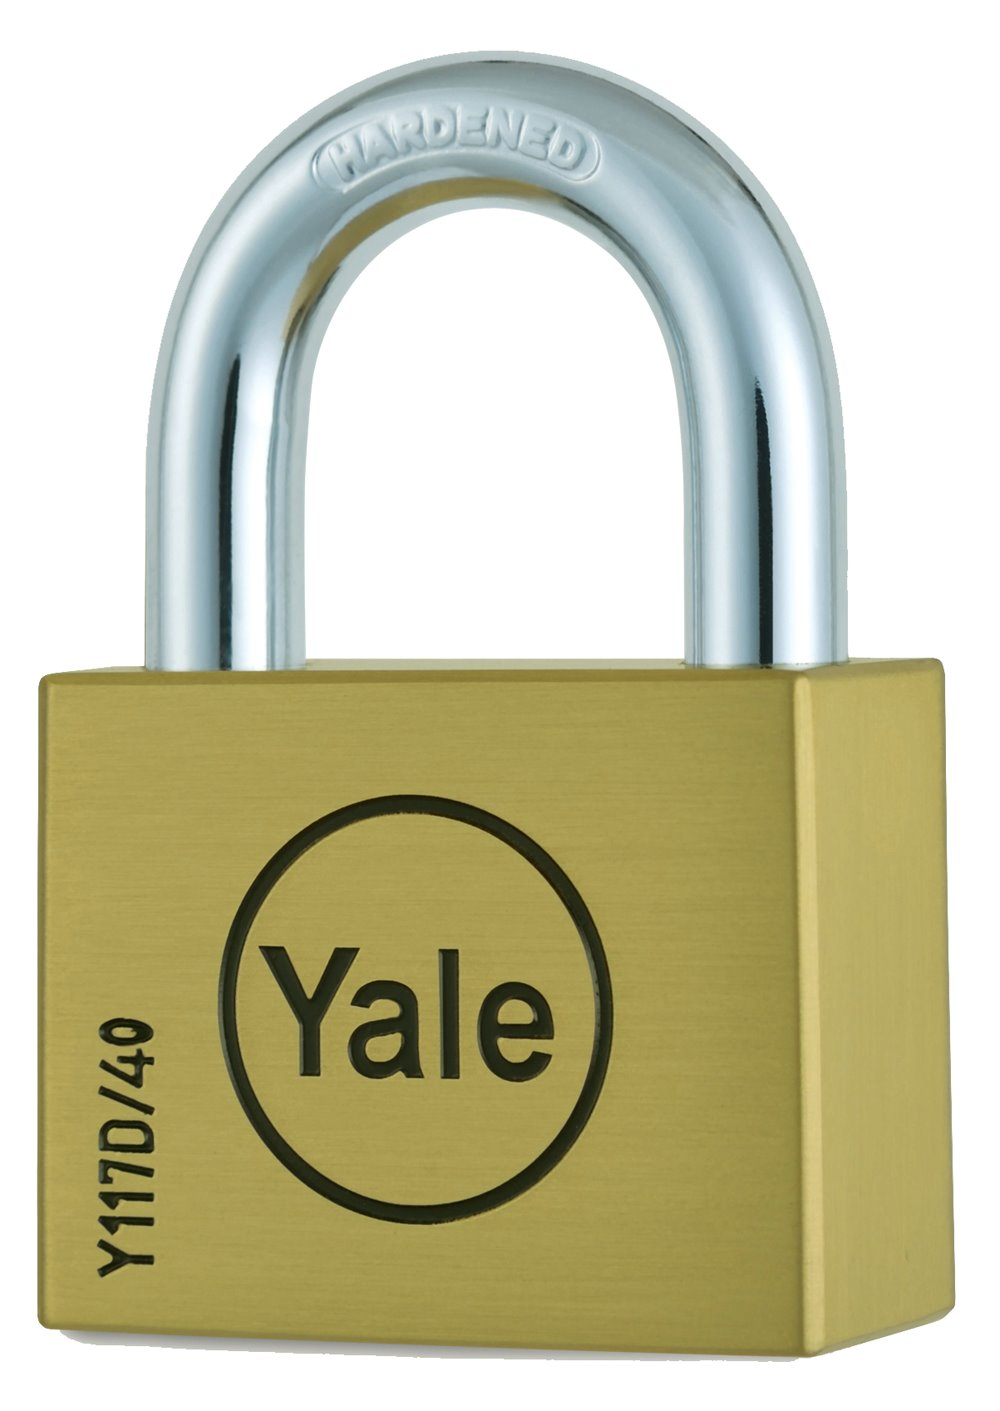 Y117D/40/121 - Yale Disc Padlock 40mm